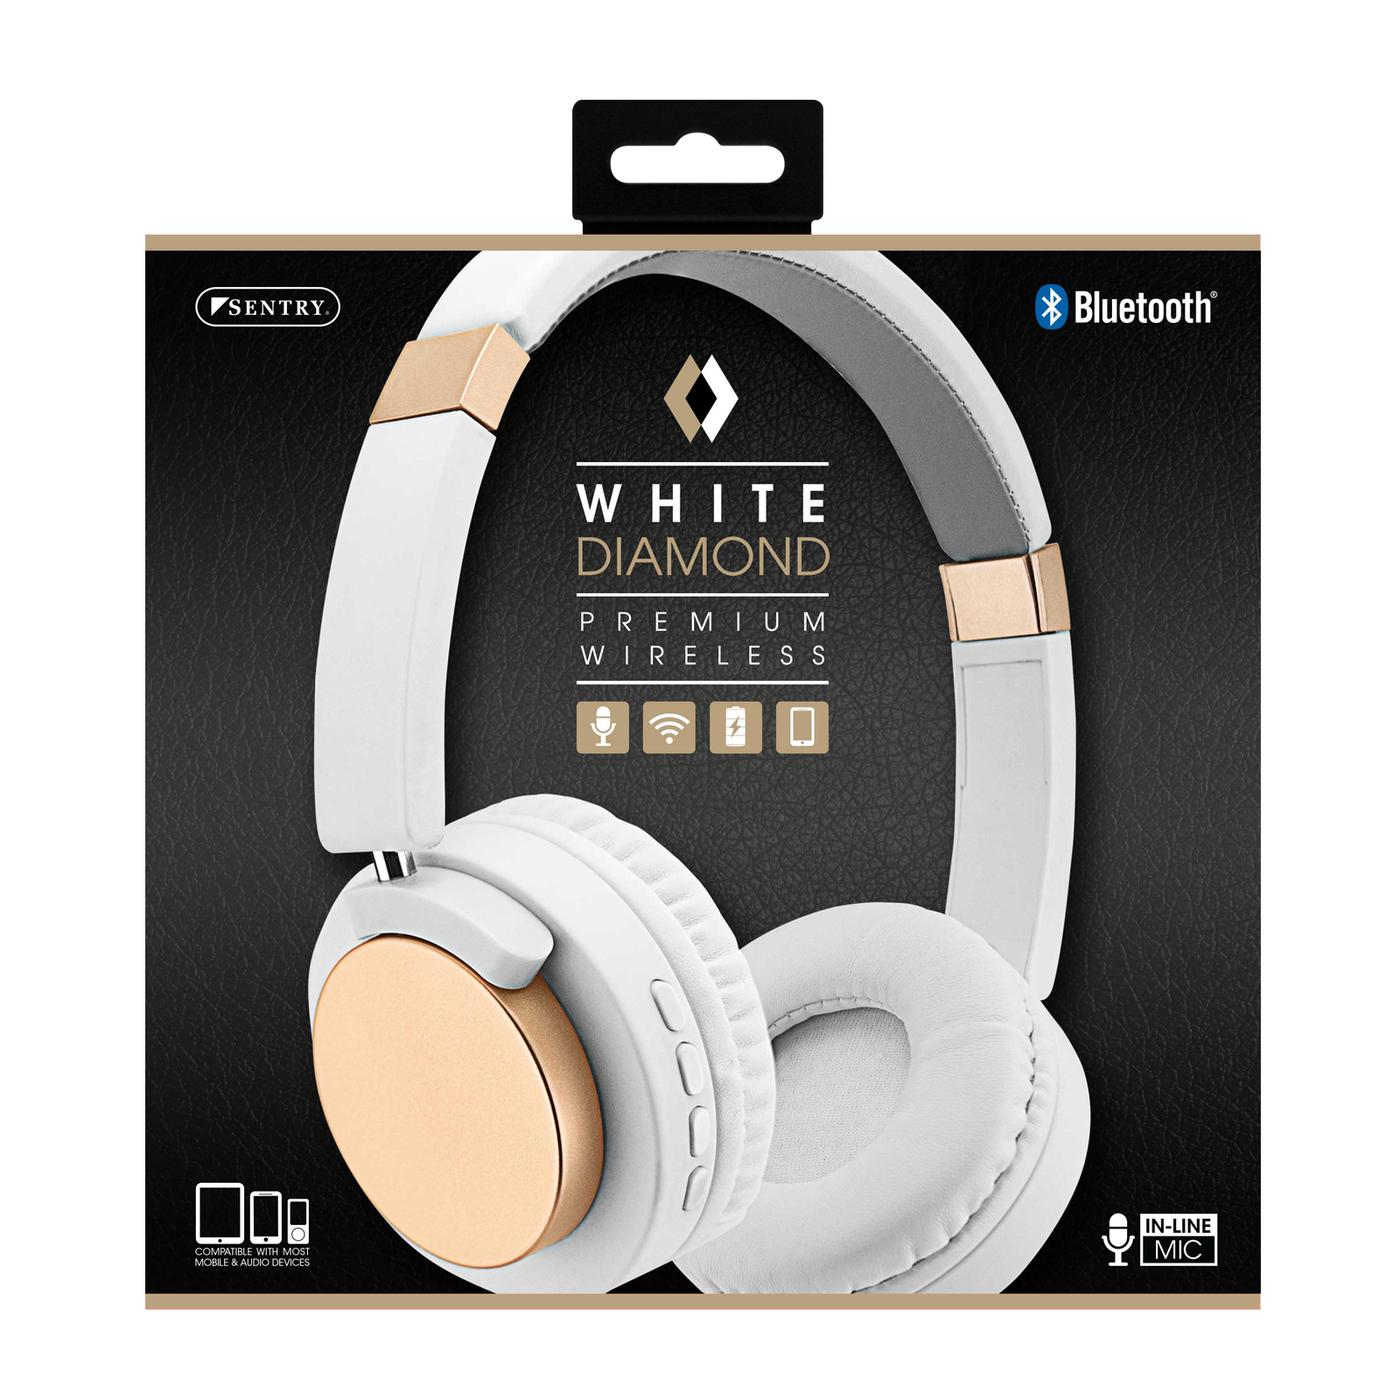 Sentry Industries BT502: White Diamond Premium Wireless Bluetooth Headset